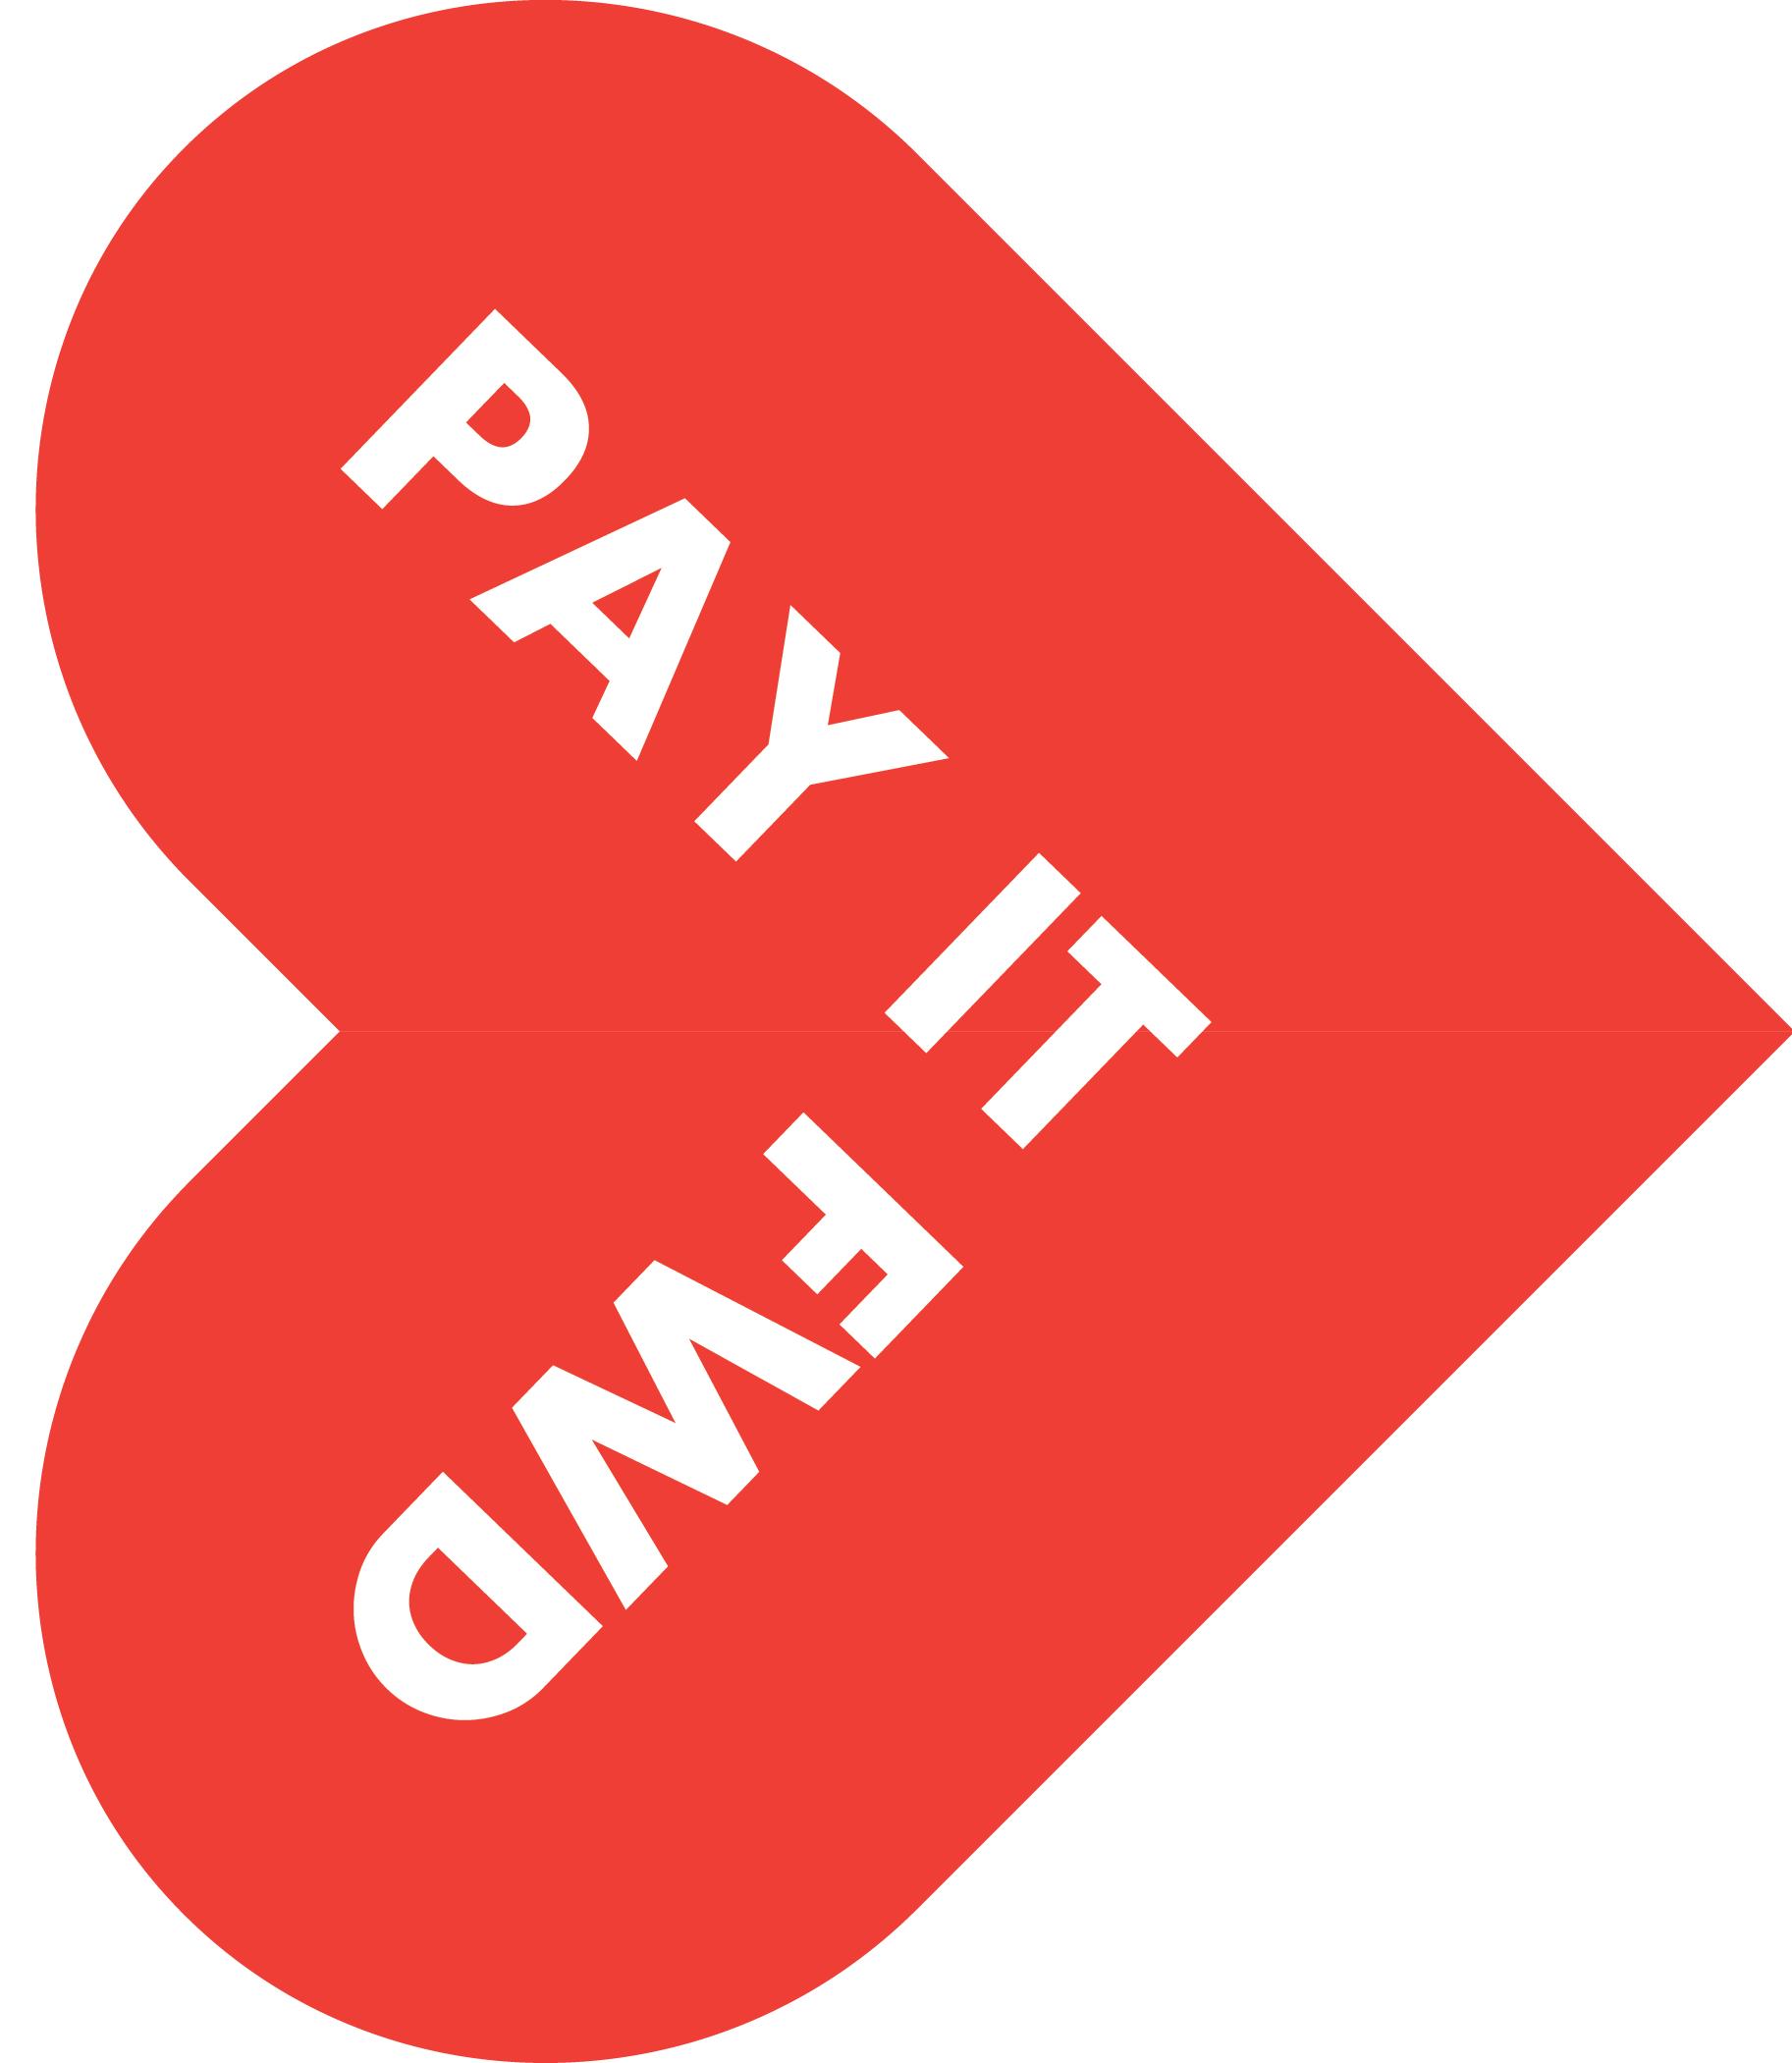 PAY IT FDW